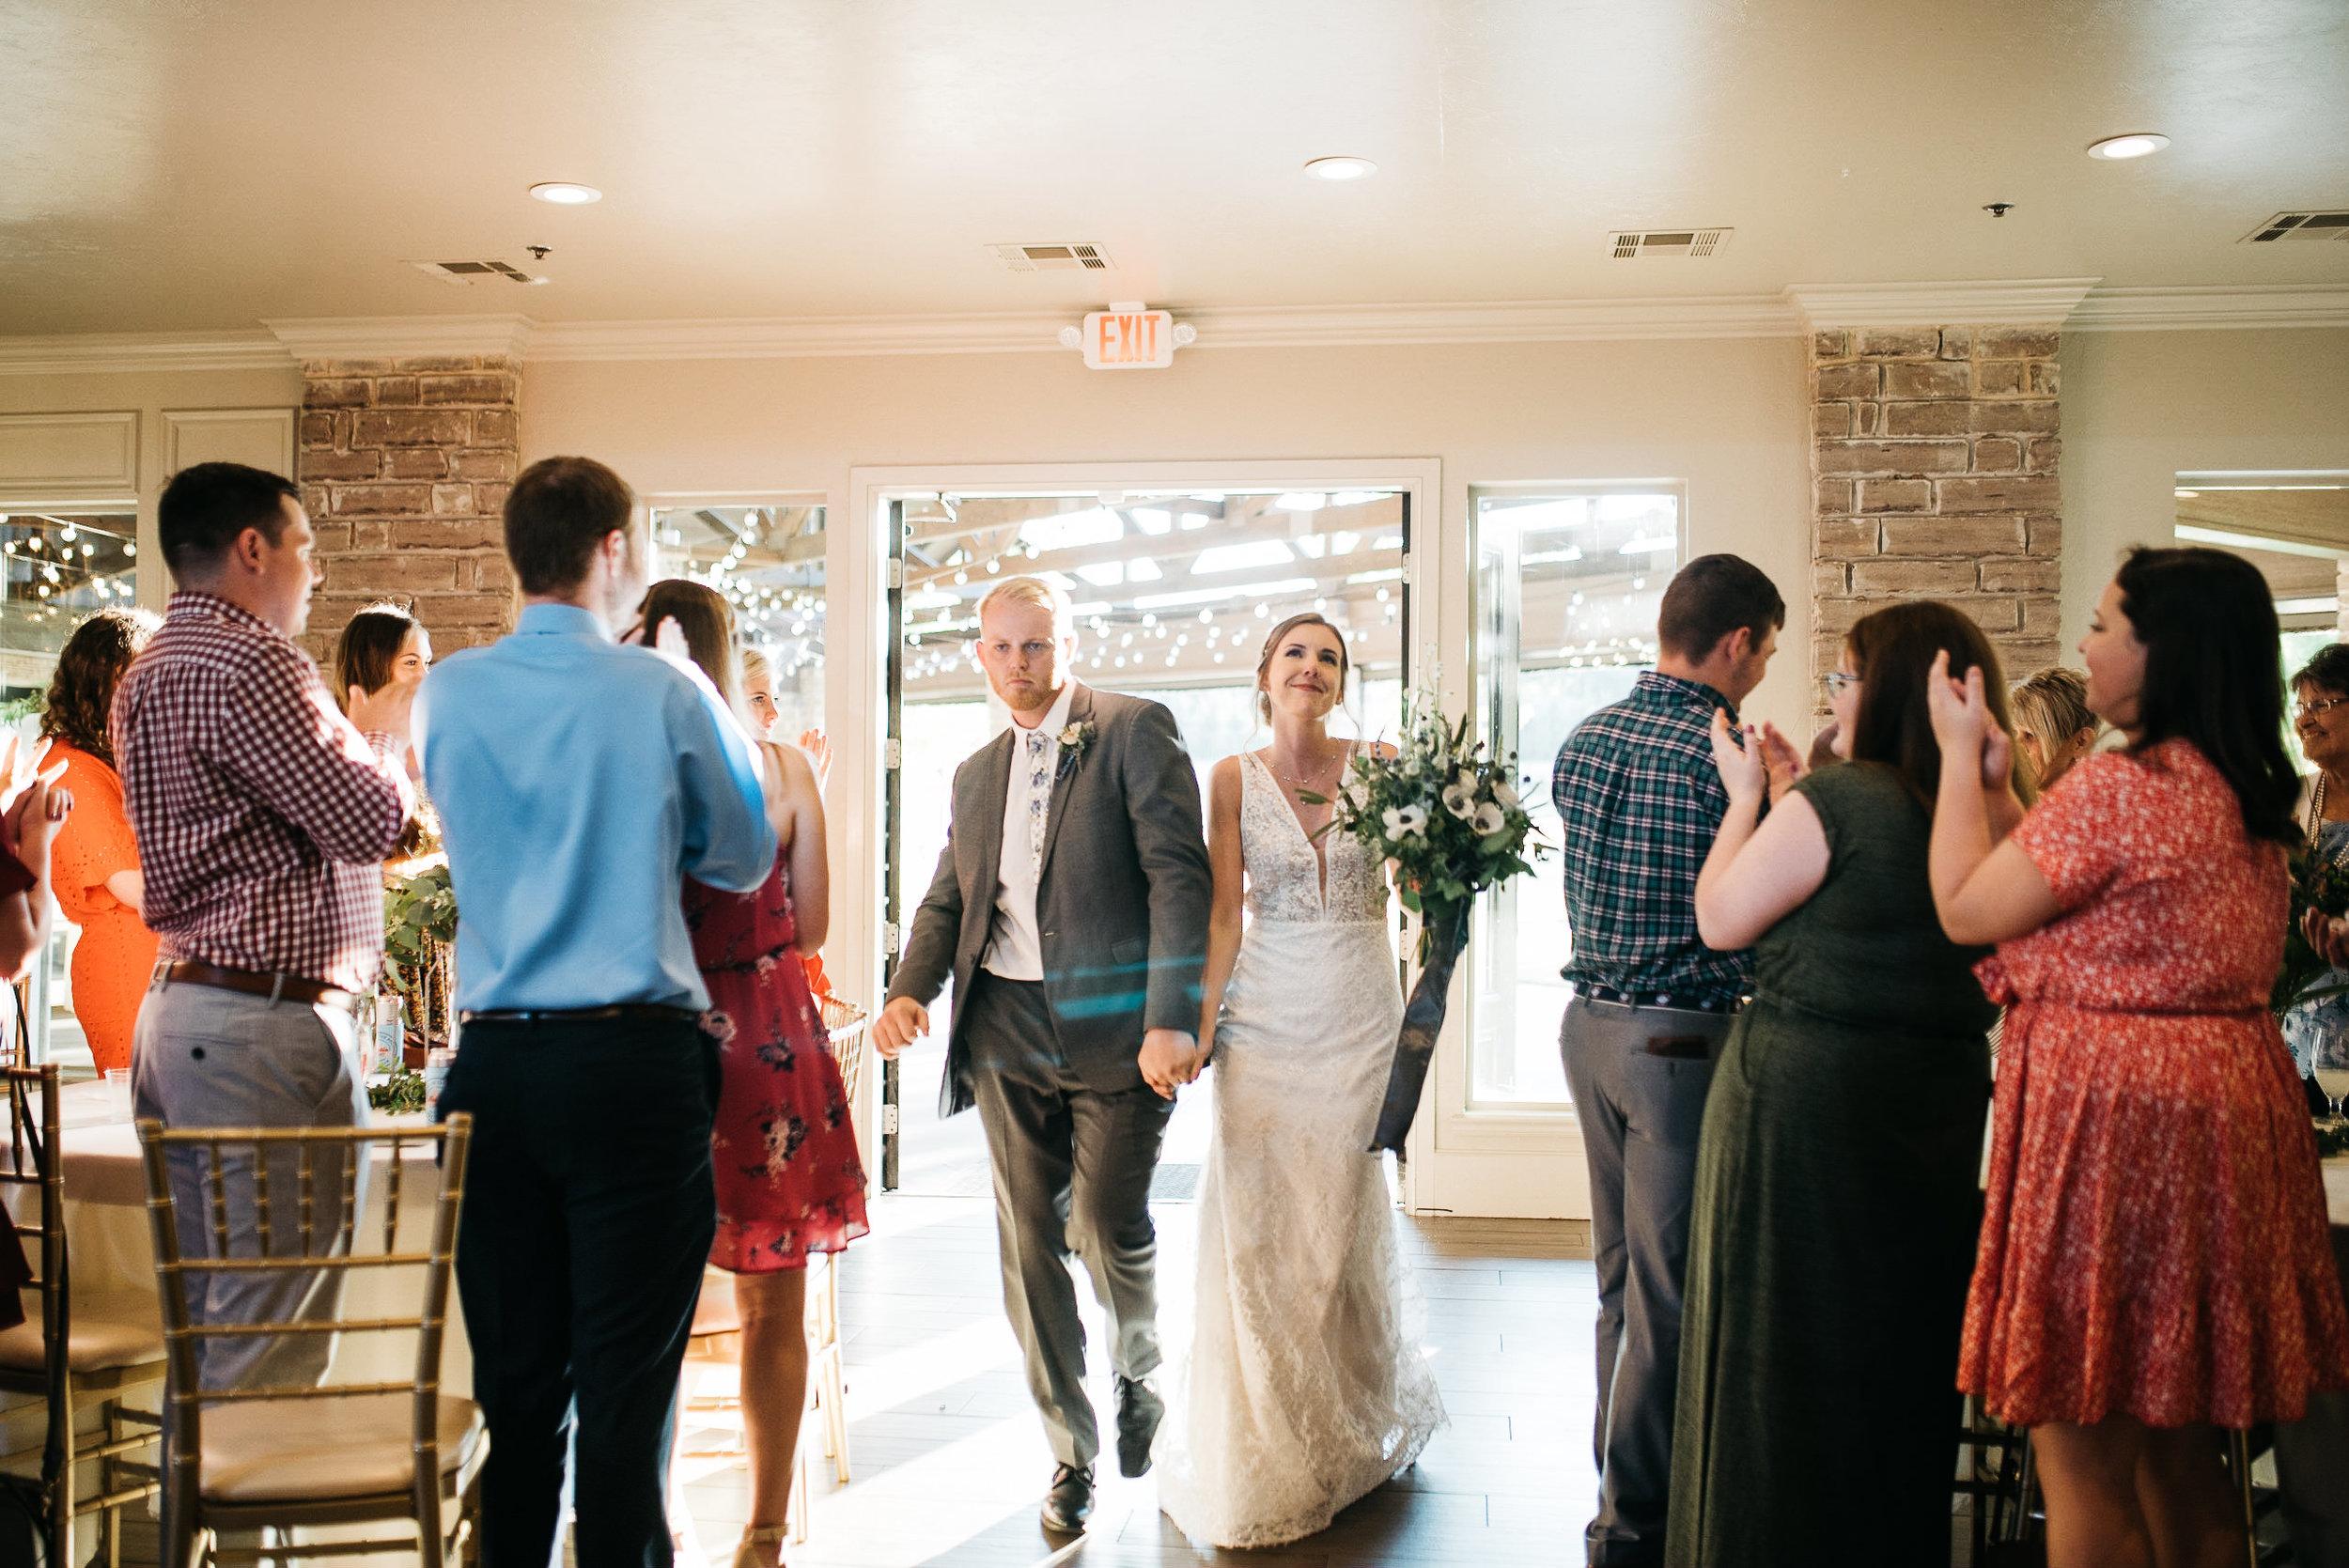 okc-wedding-photographer-coles-garden-wedding-okc-best-wedding-photographers-135.jpg